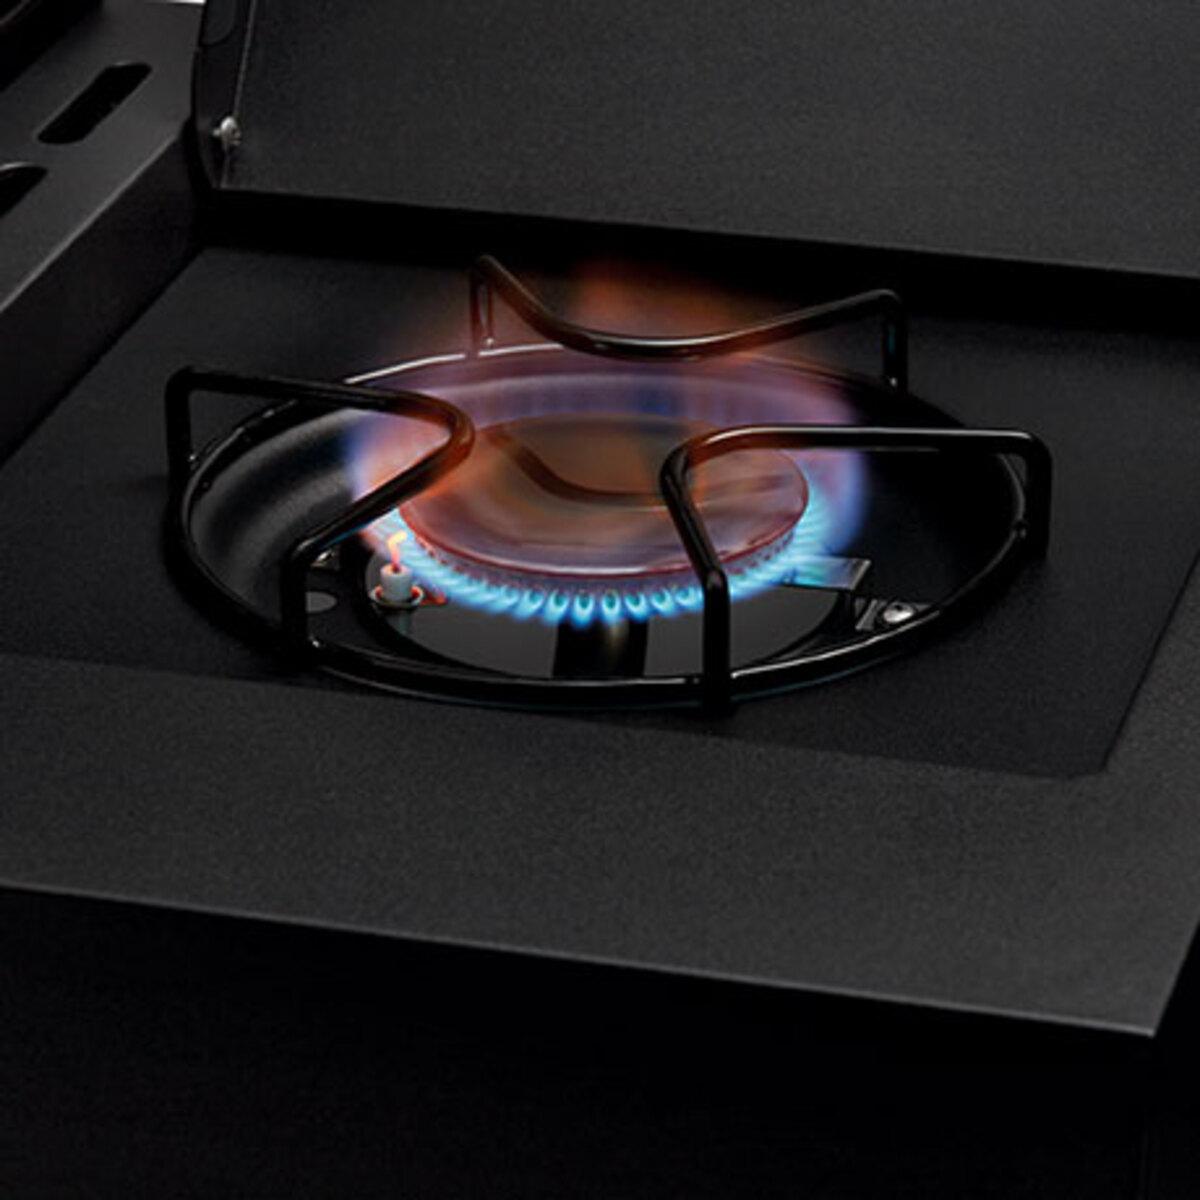 Bild 5 von Gasgrill Boston Black Pro 4 SIKR Turbo1